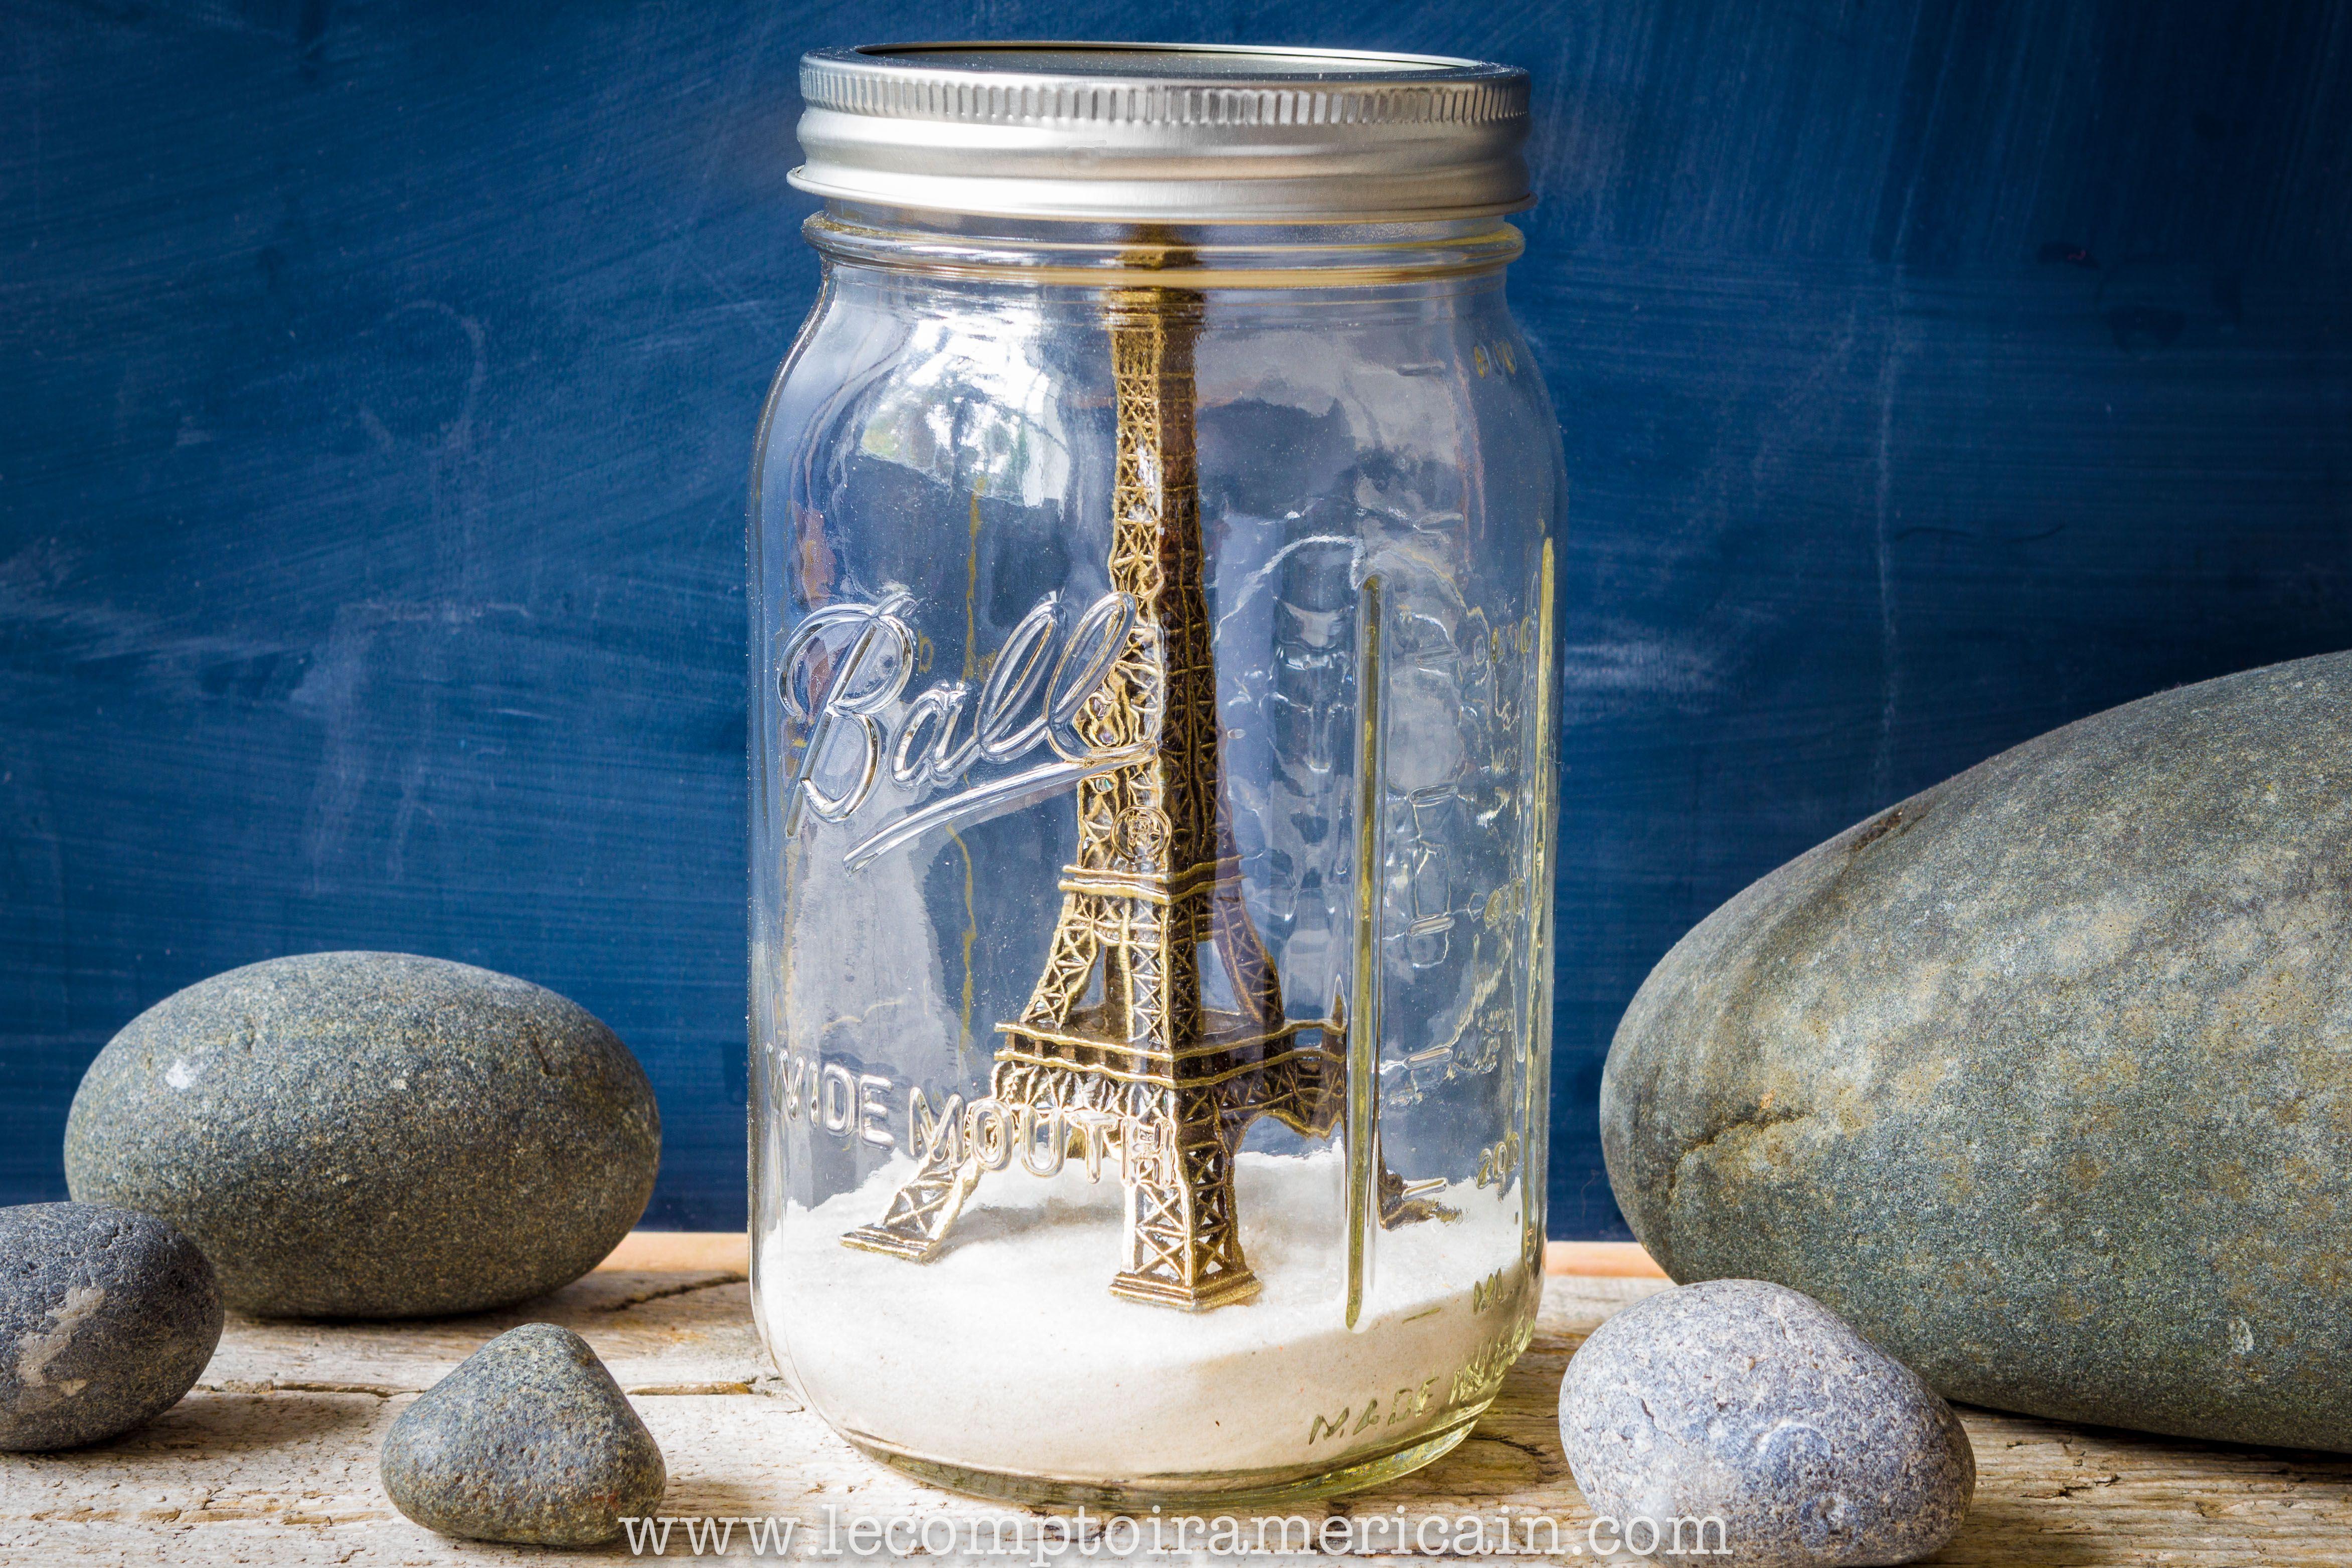 Idee Cadeau A Paris.Paris In A Mason Jar Mason Jar Ball Americanproduct